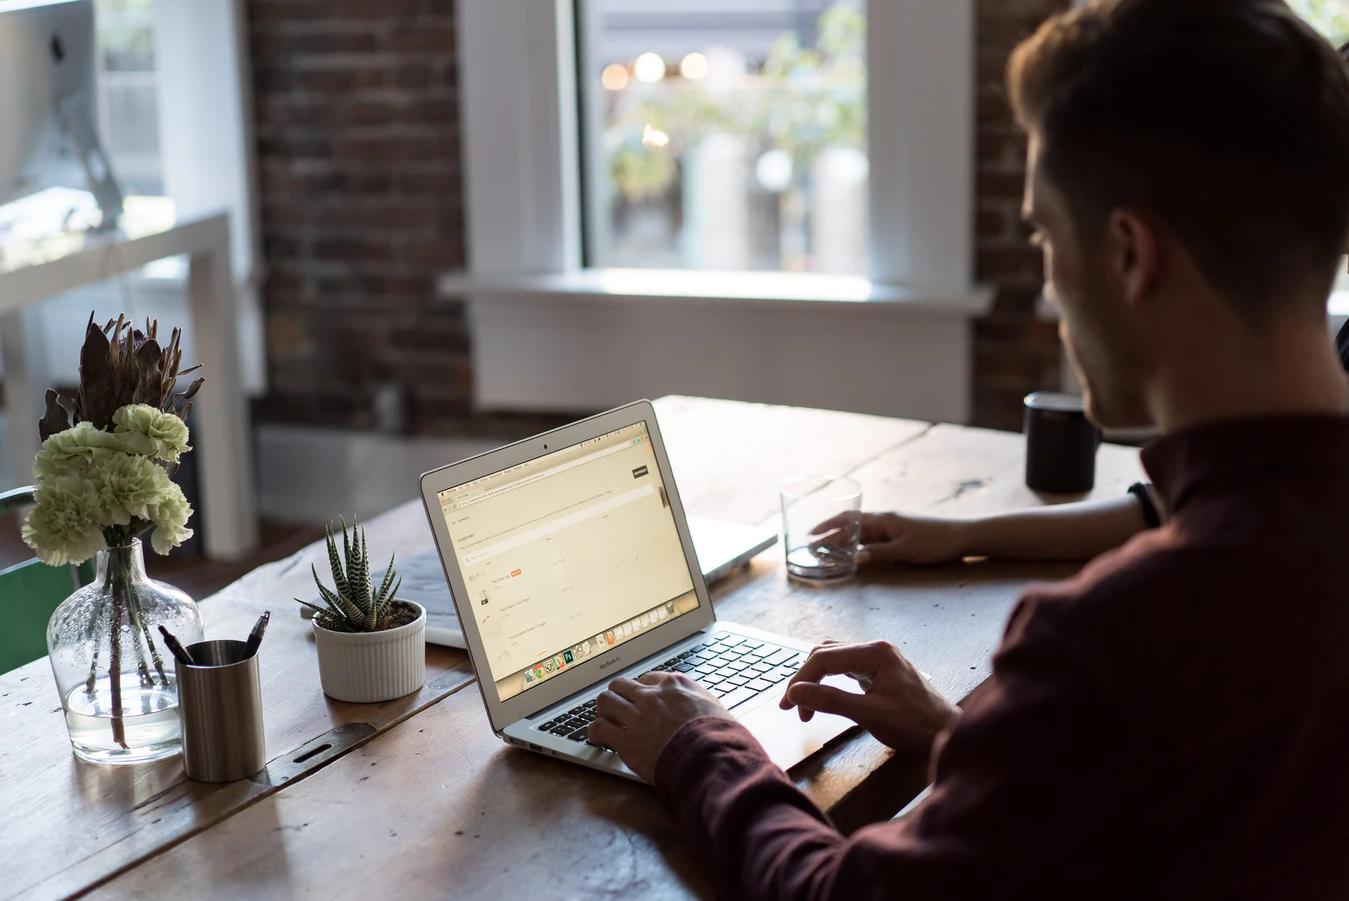 Guru vs Upwork vs StaffVirtual: Comparing Freelancer Market Places